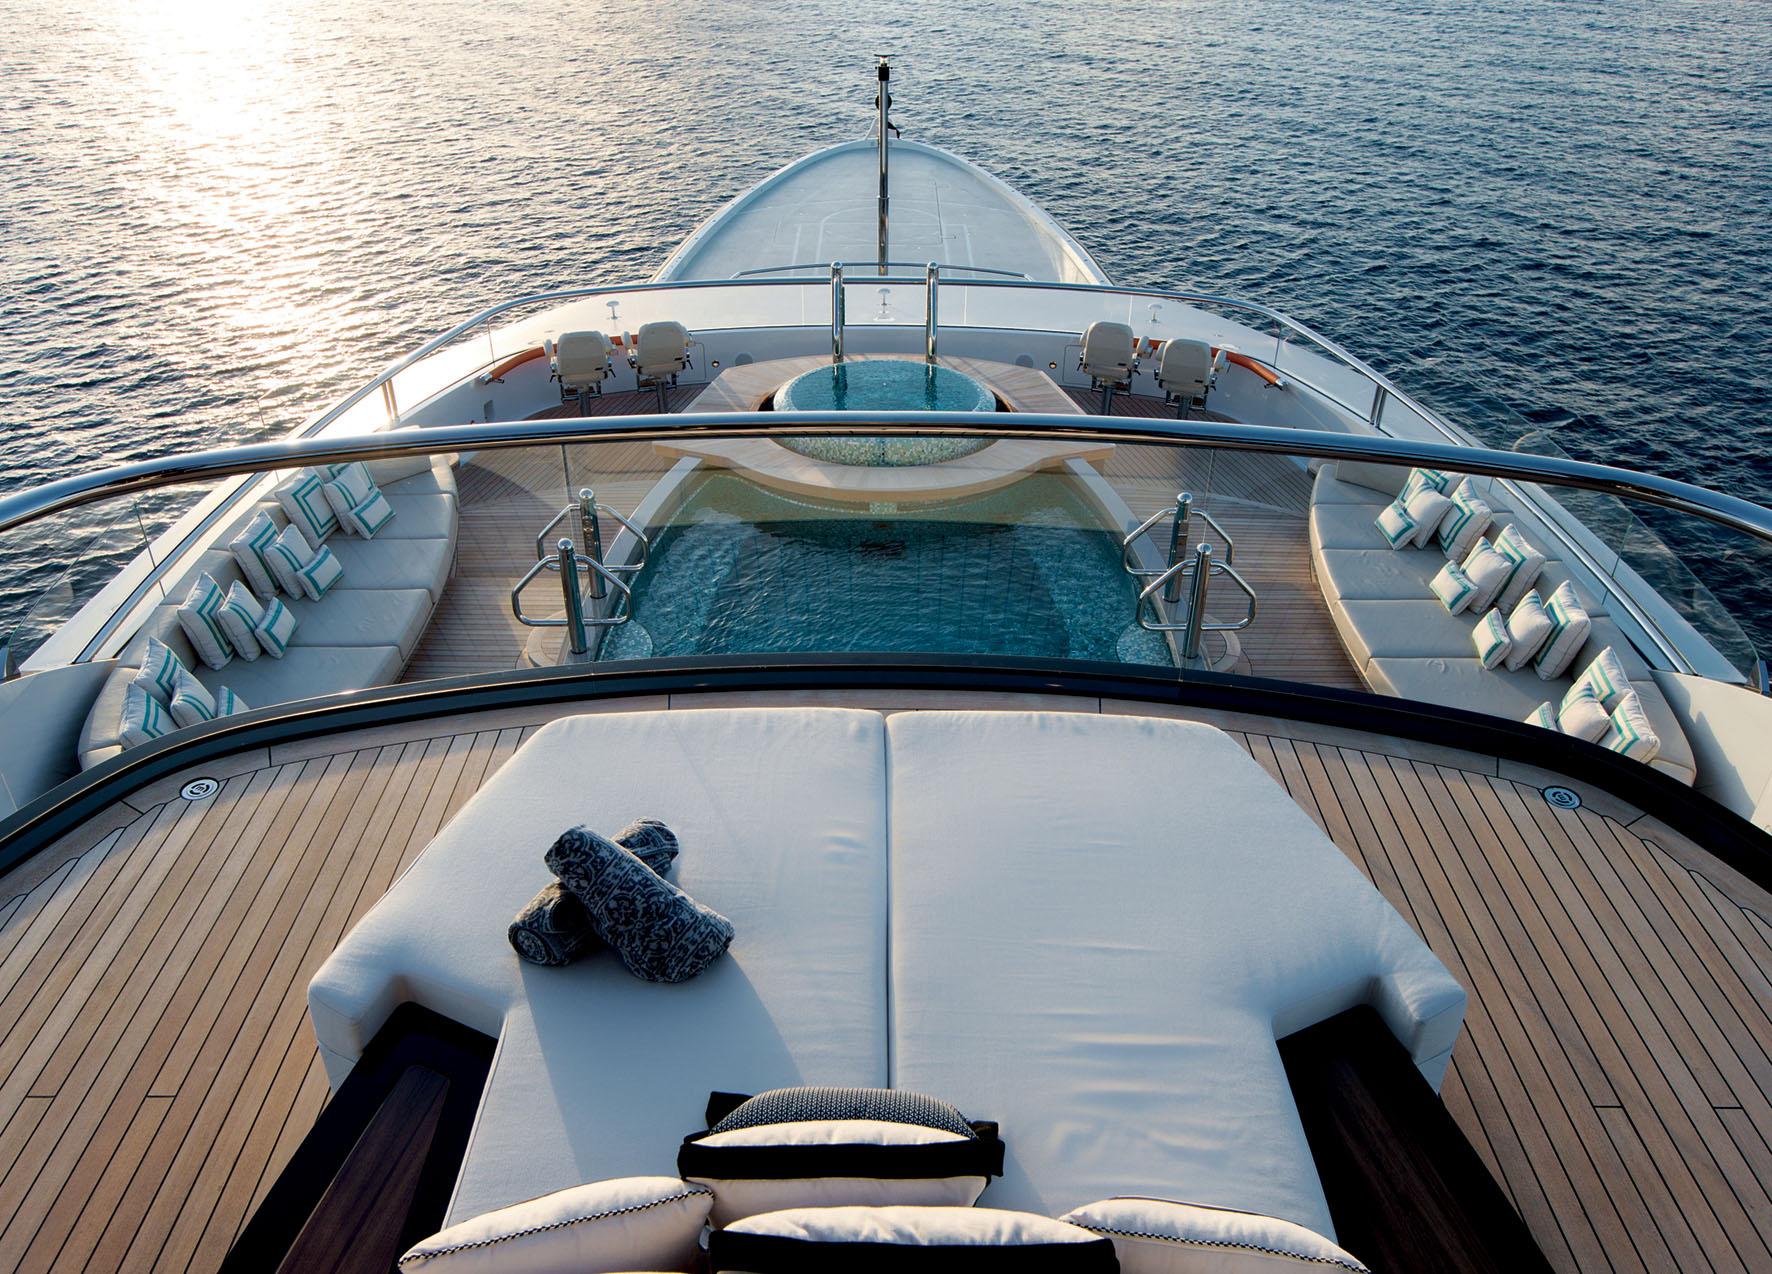 SuperyachtLife-On-The-High-Seas-Tony-Harris-Fort-Lauderdale-Venice-Magazine-4